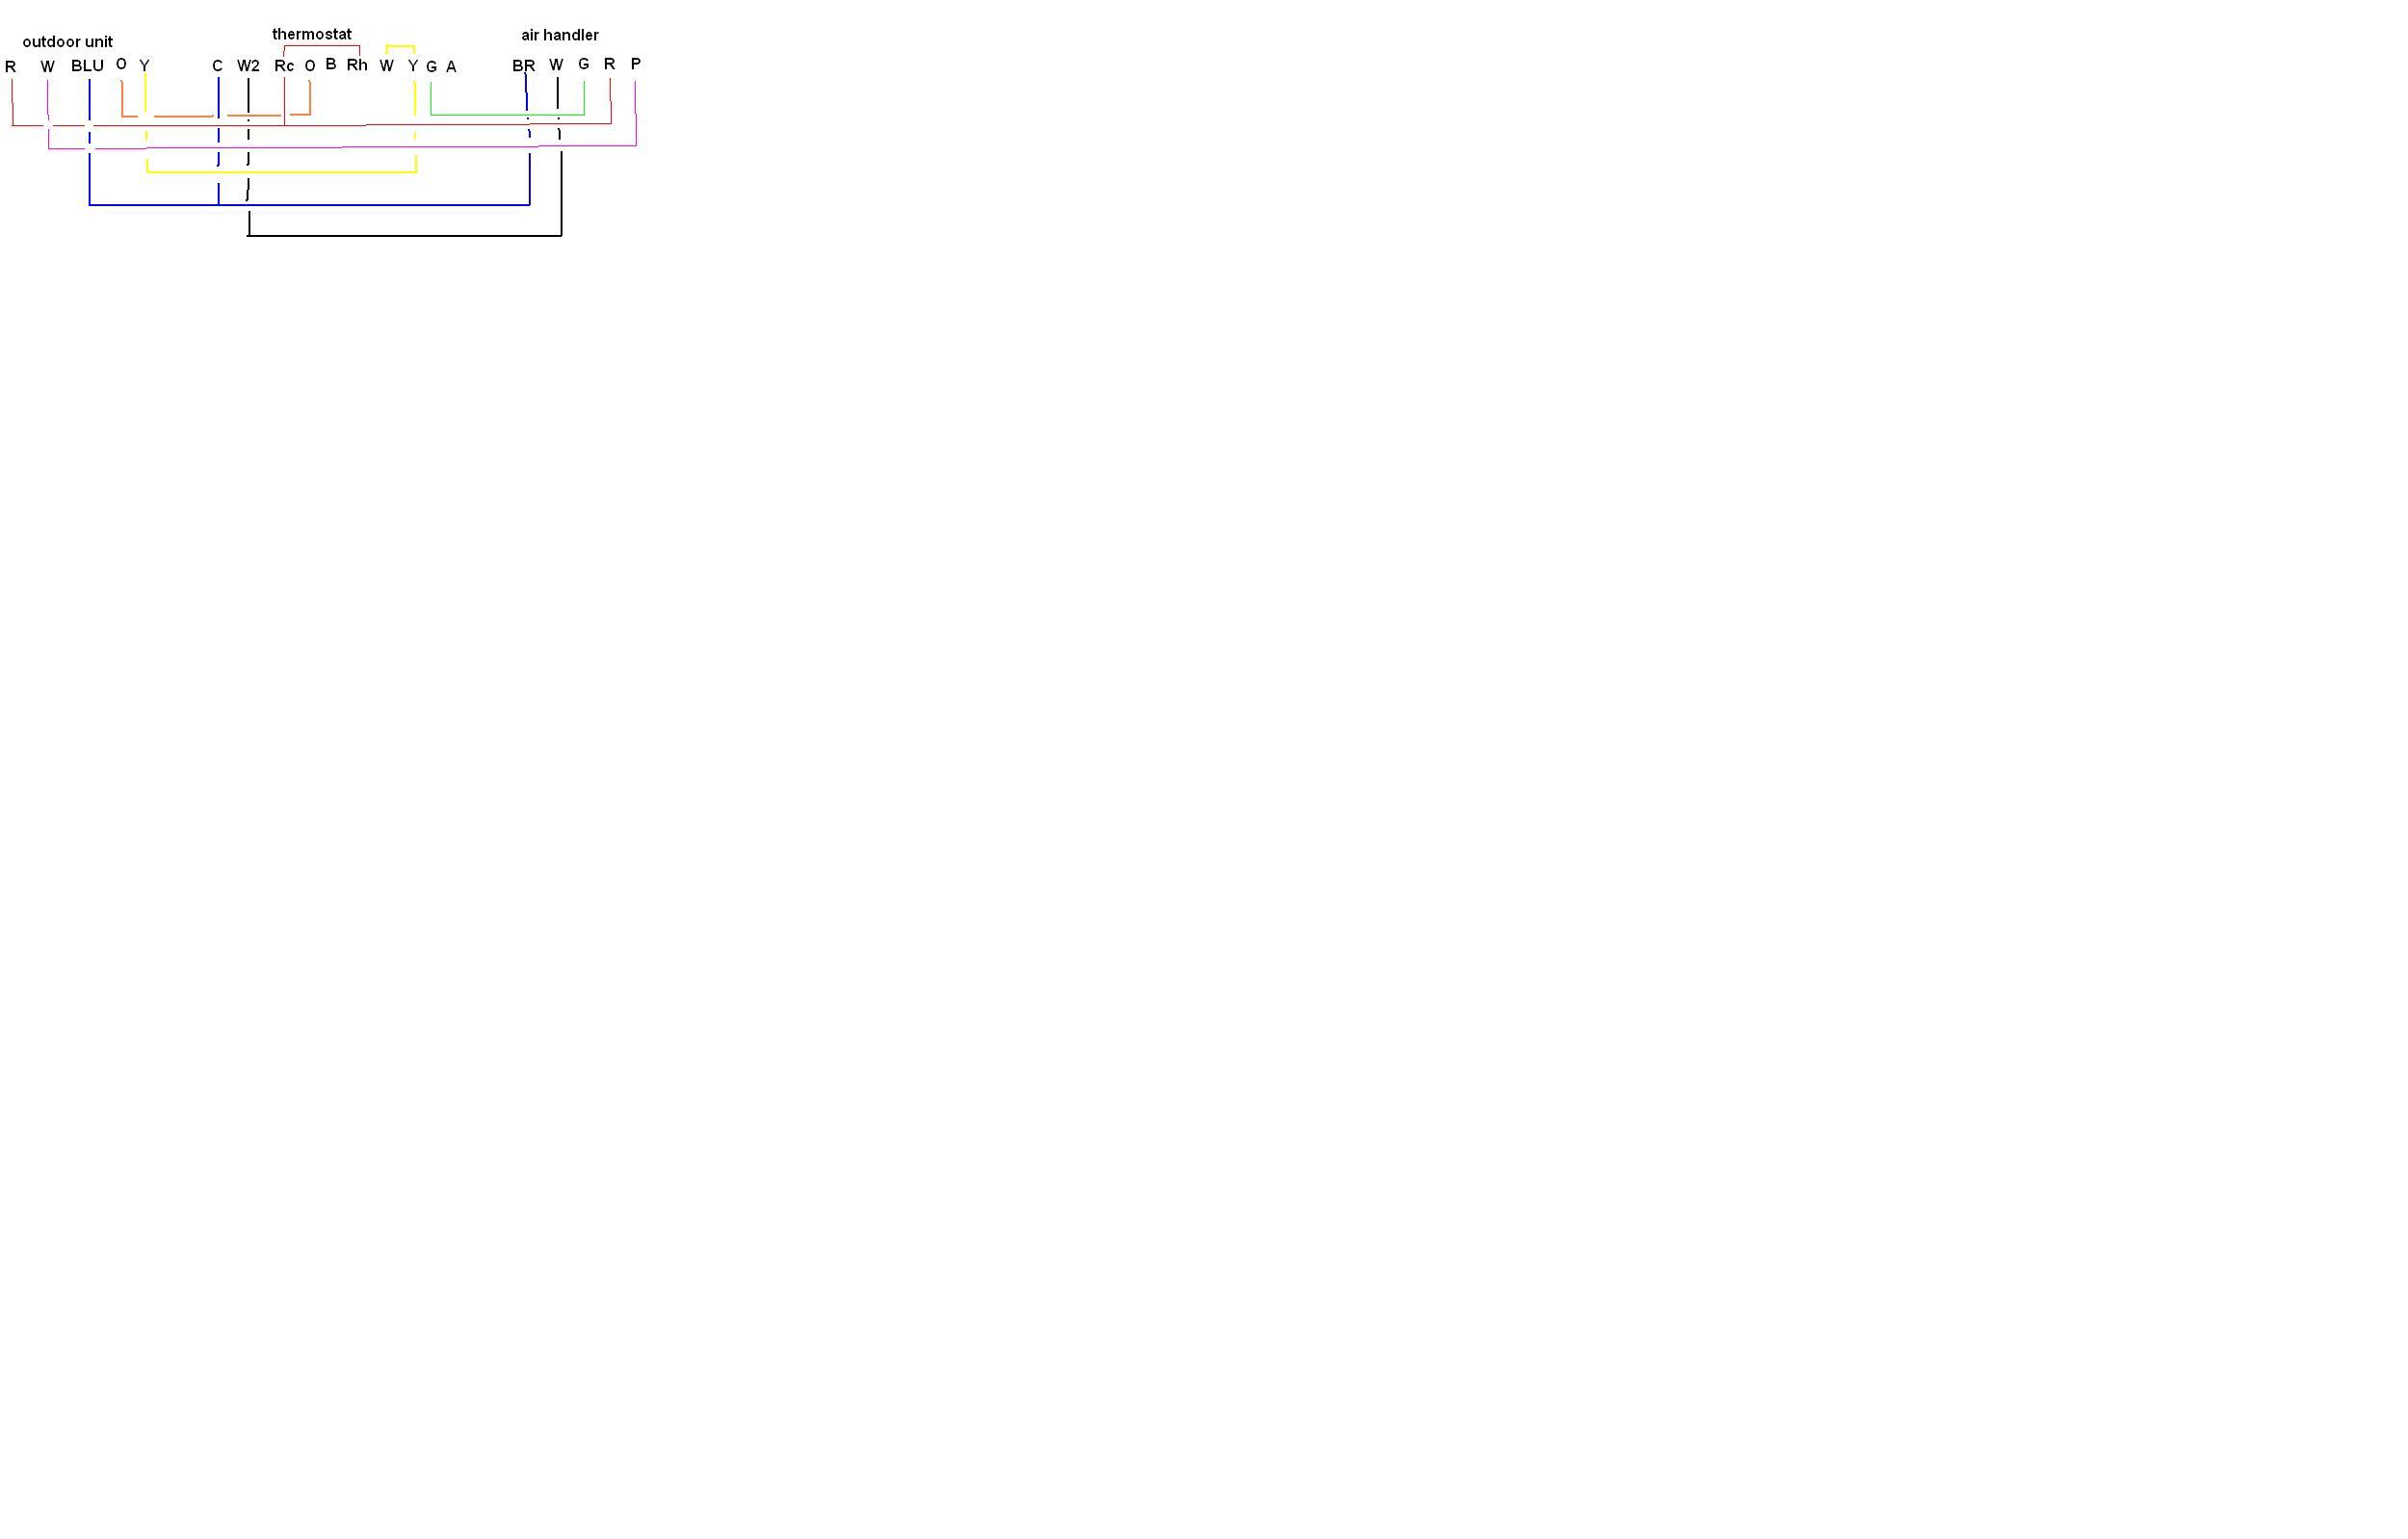 Accutrac ke Controller Wiring Diagram - Wiring Diagrams ... on